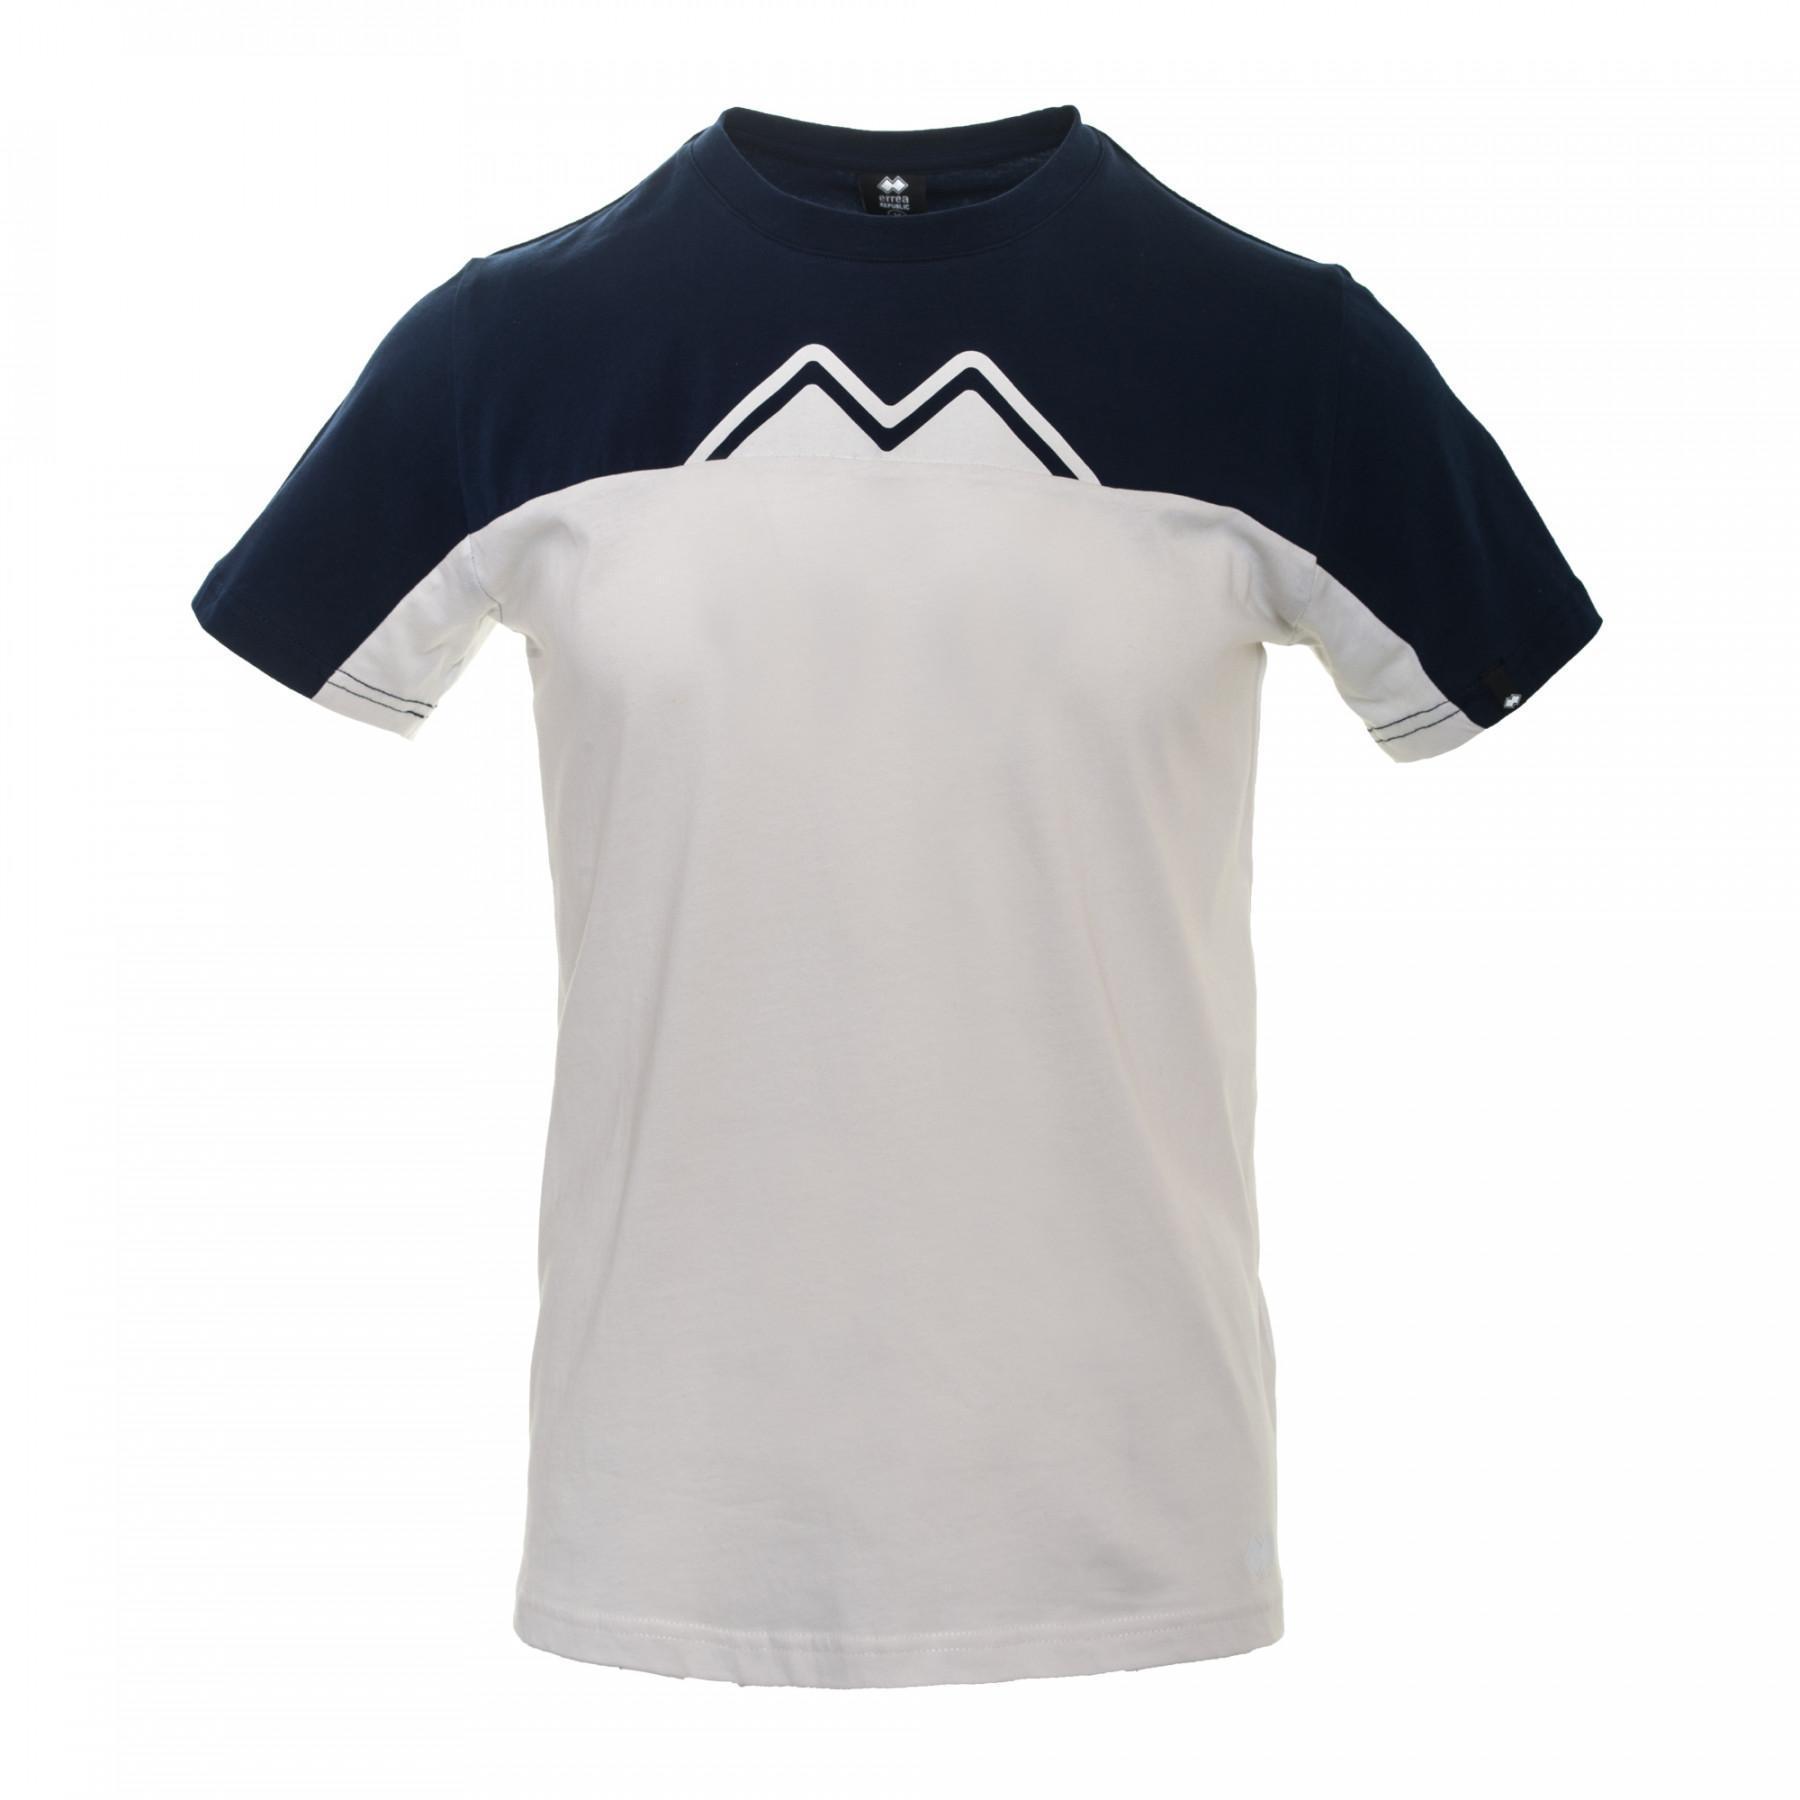 T-shirt Errea contemporary colour-block ad